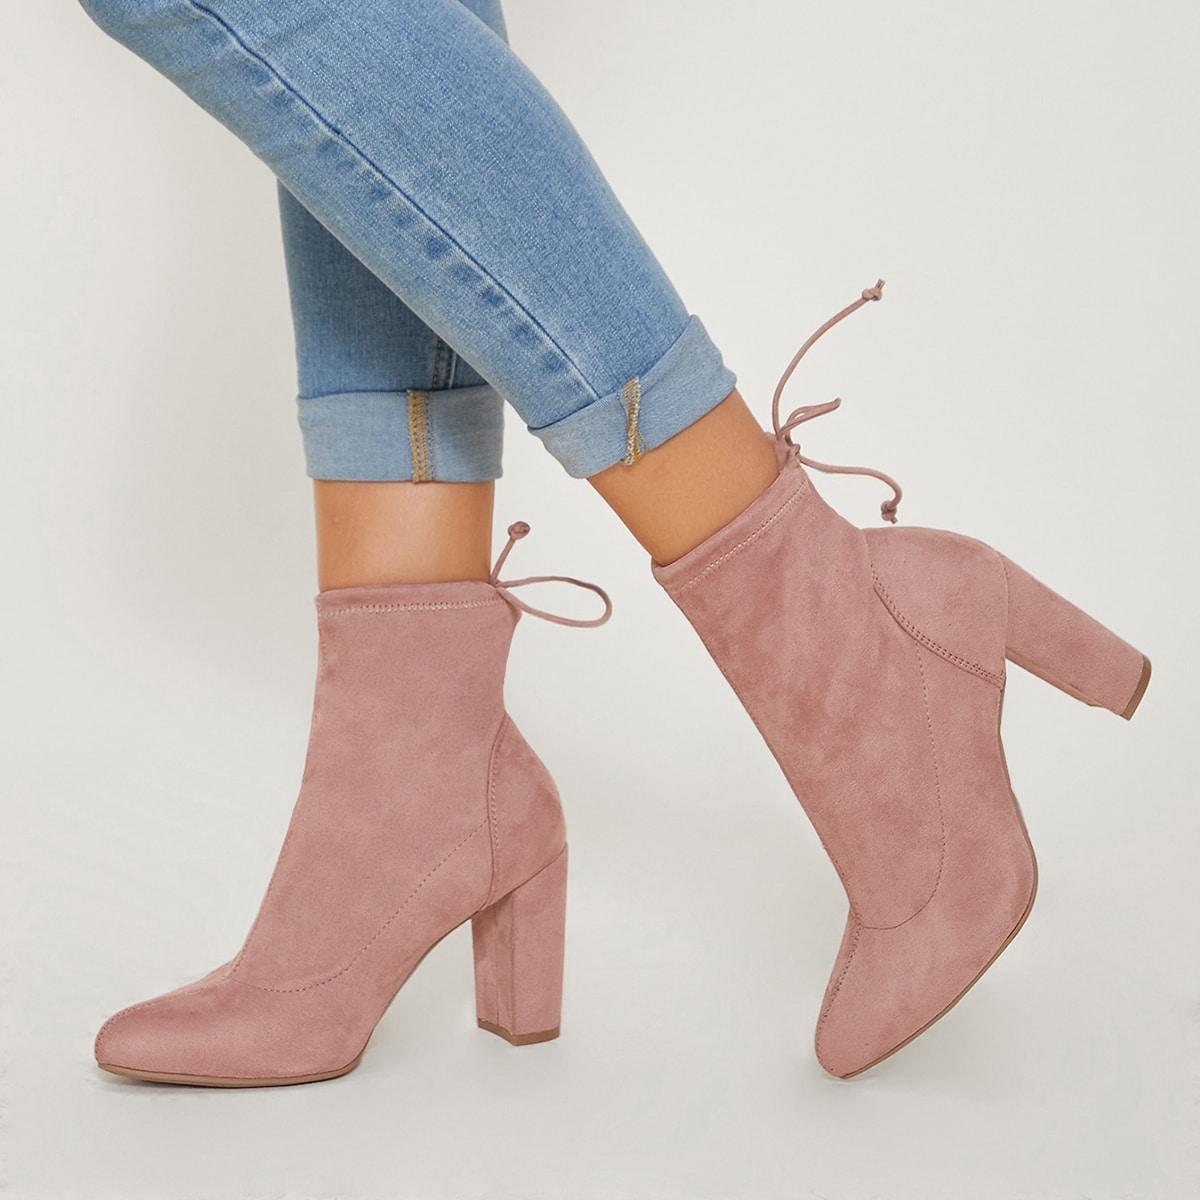 Faux Suede High Heel Sock Boots